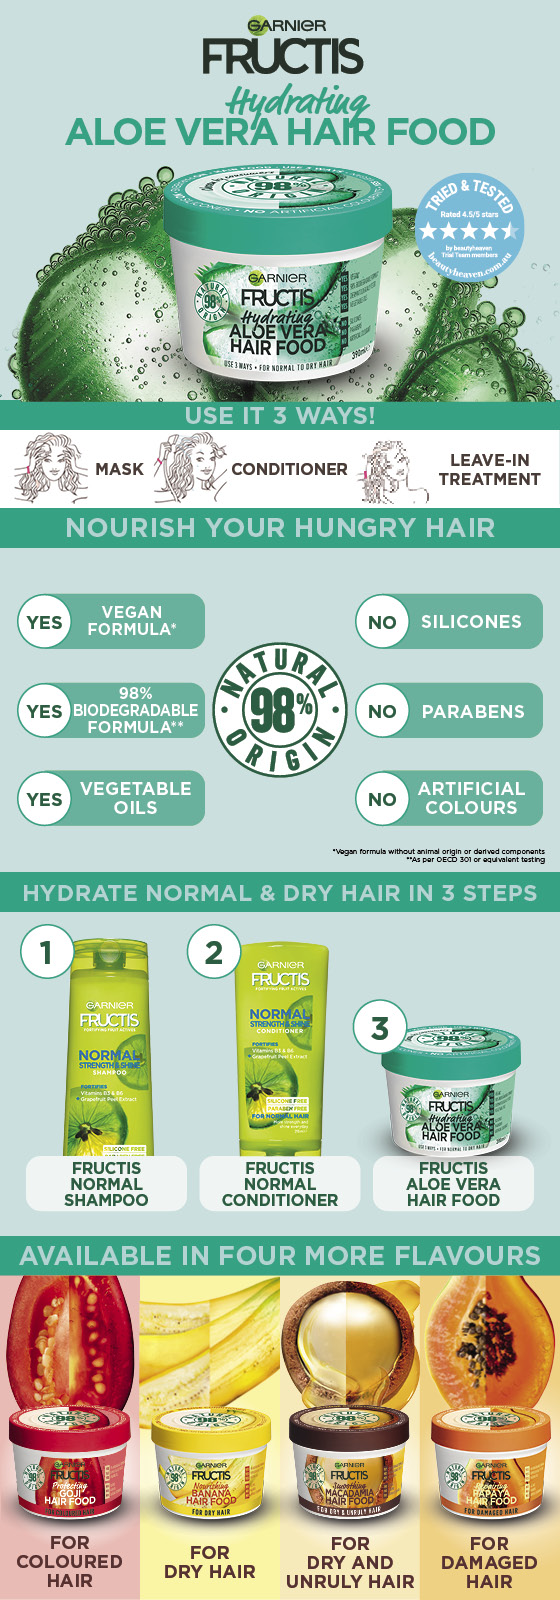 Garnier Fructis Hair Food Hydrating